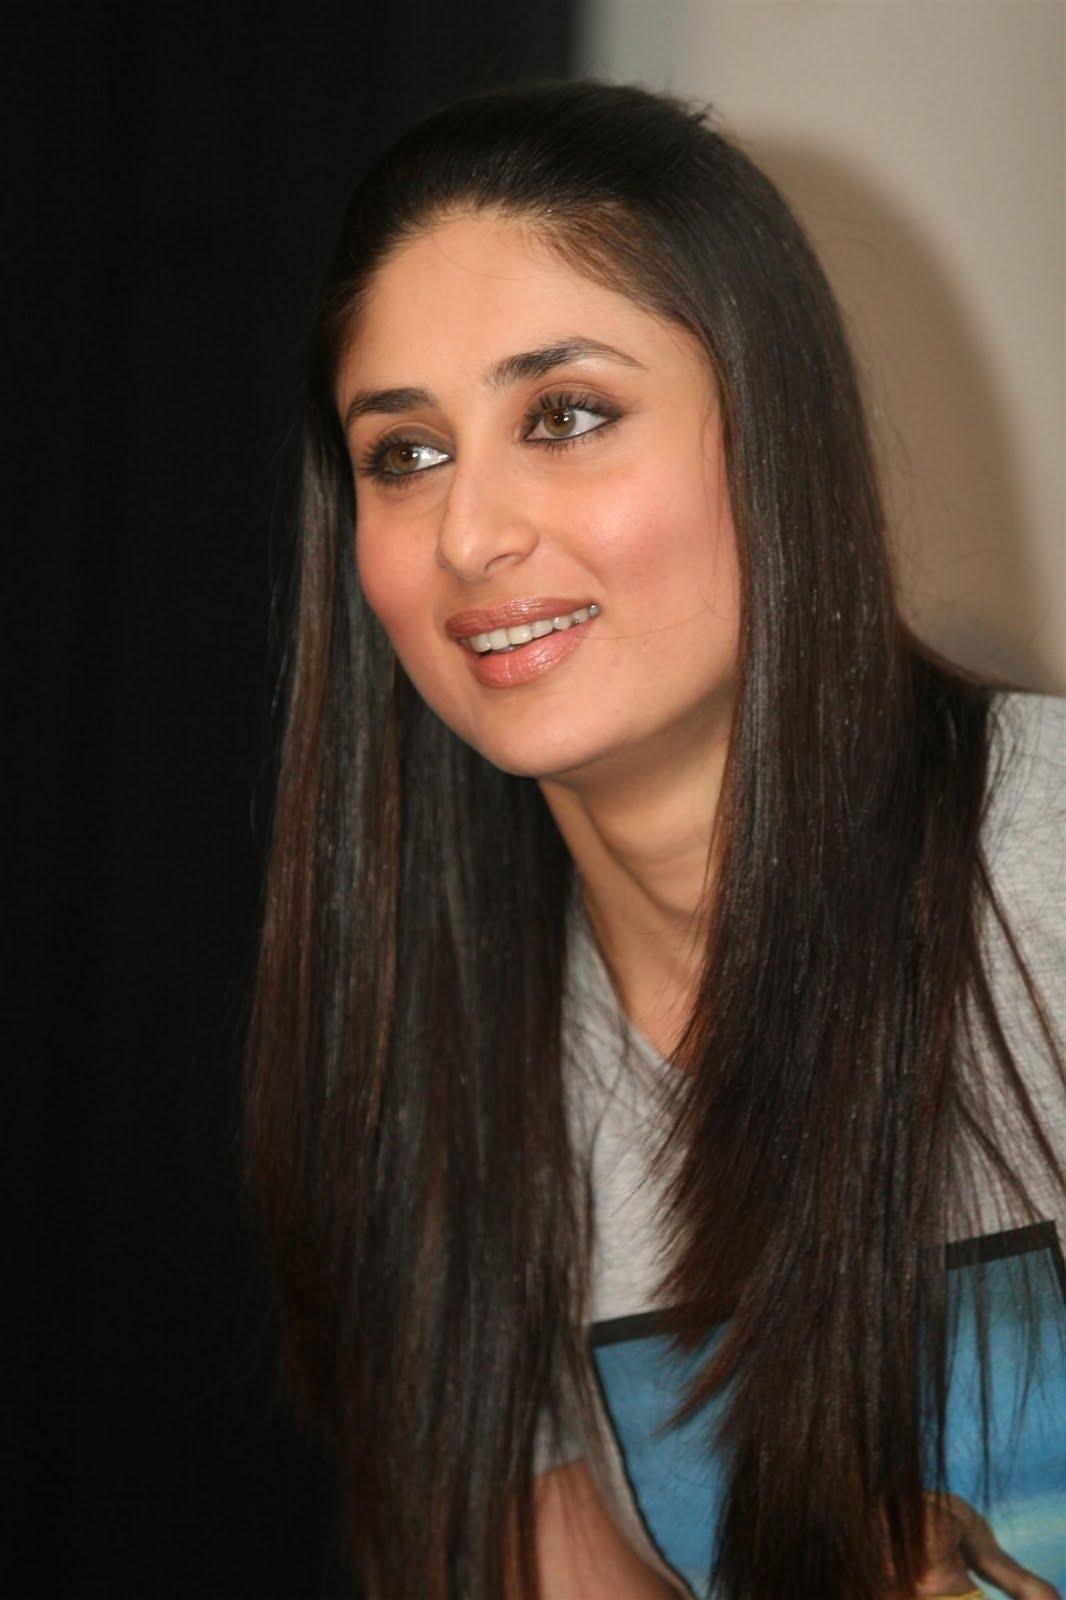 Kareena Kapoor Photo 3 Of 42 Pics Wallpaper Photo